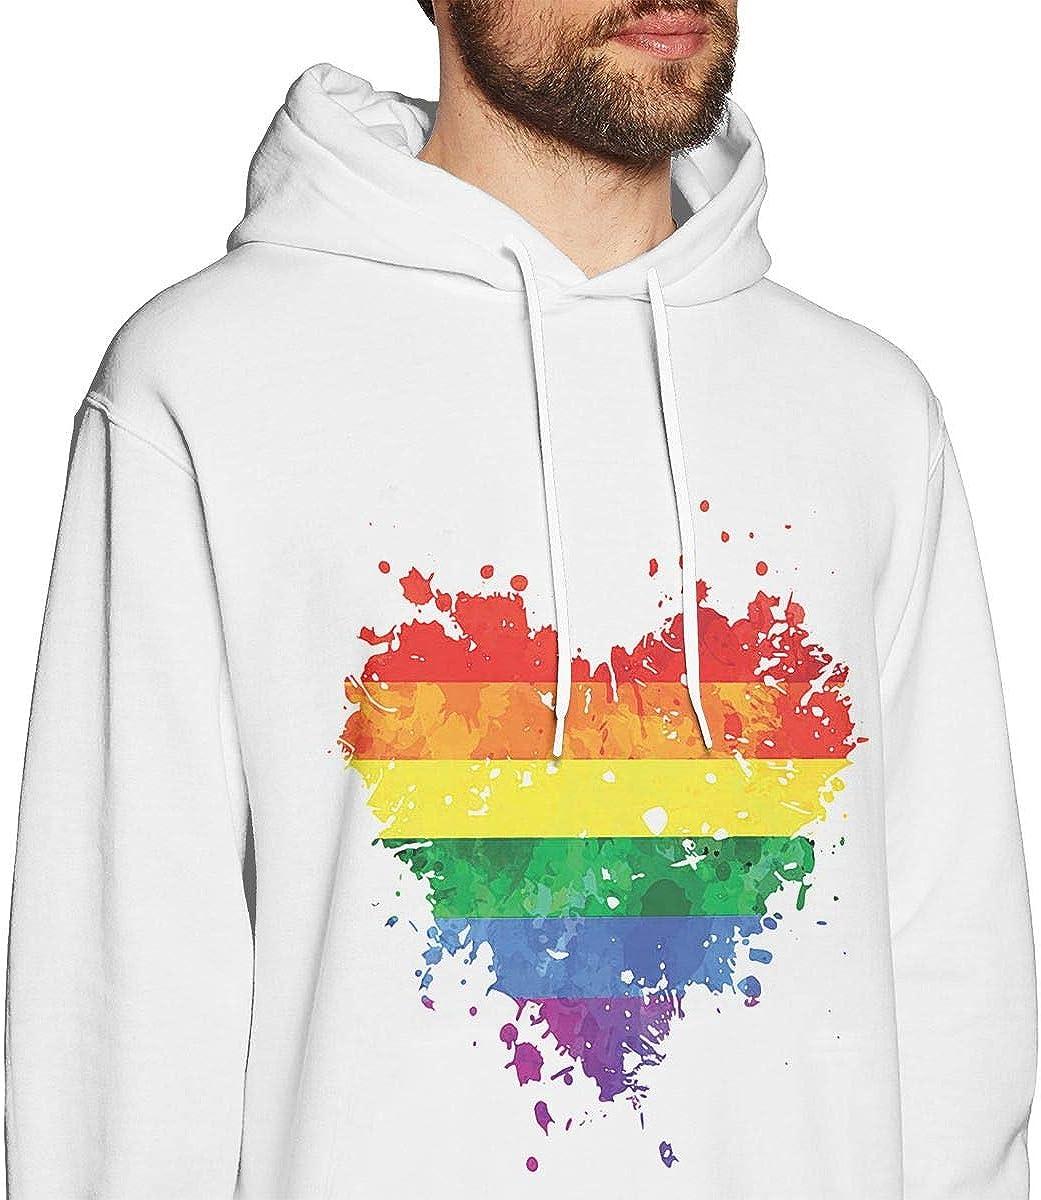 FTHX Mens Hoodies Painting Heart LGBT Fashion Pullover Hooded Print Sweatshirt Jackets